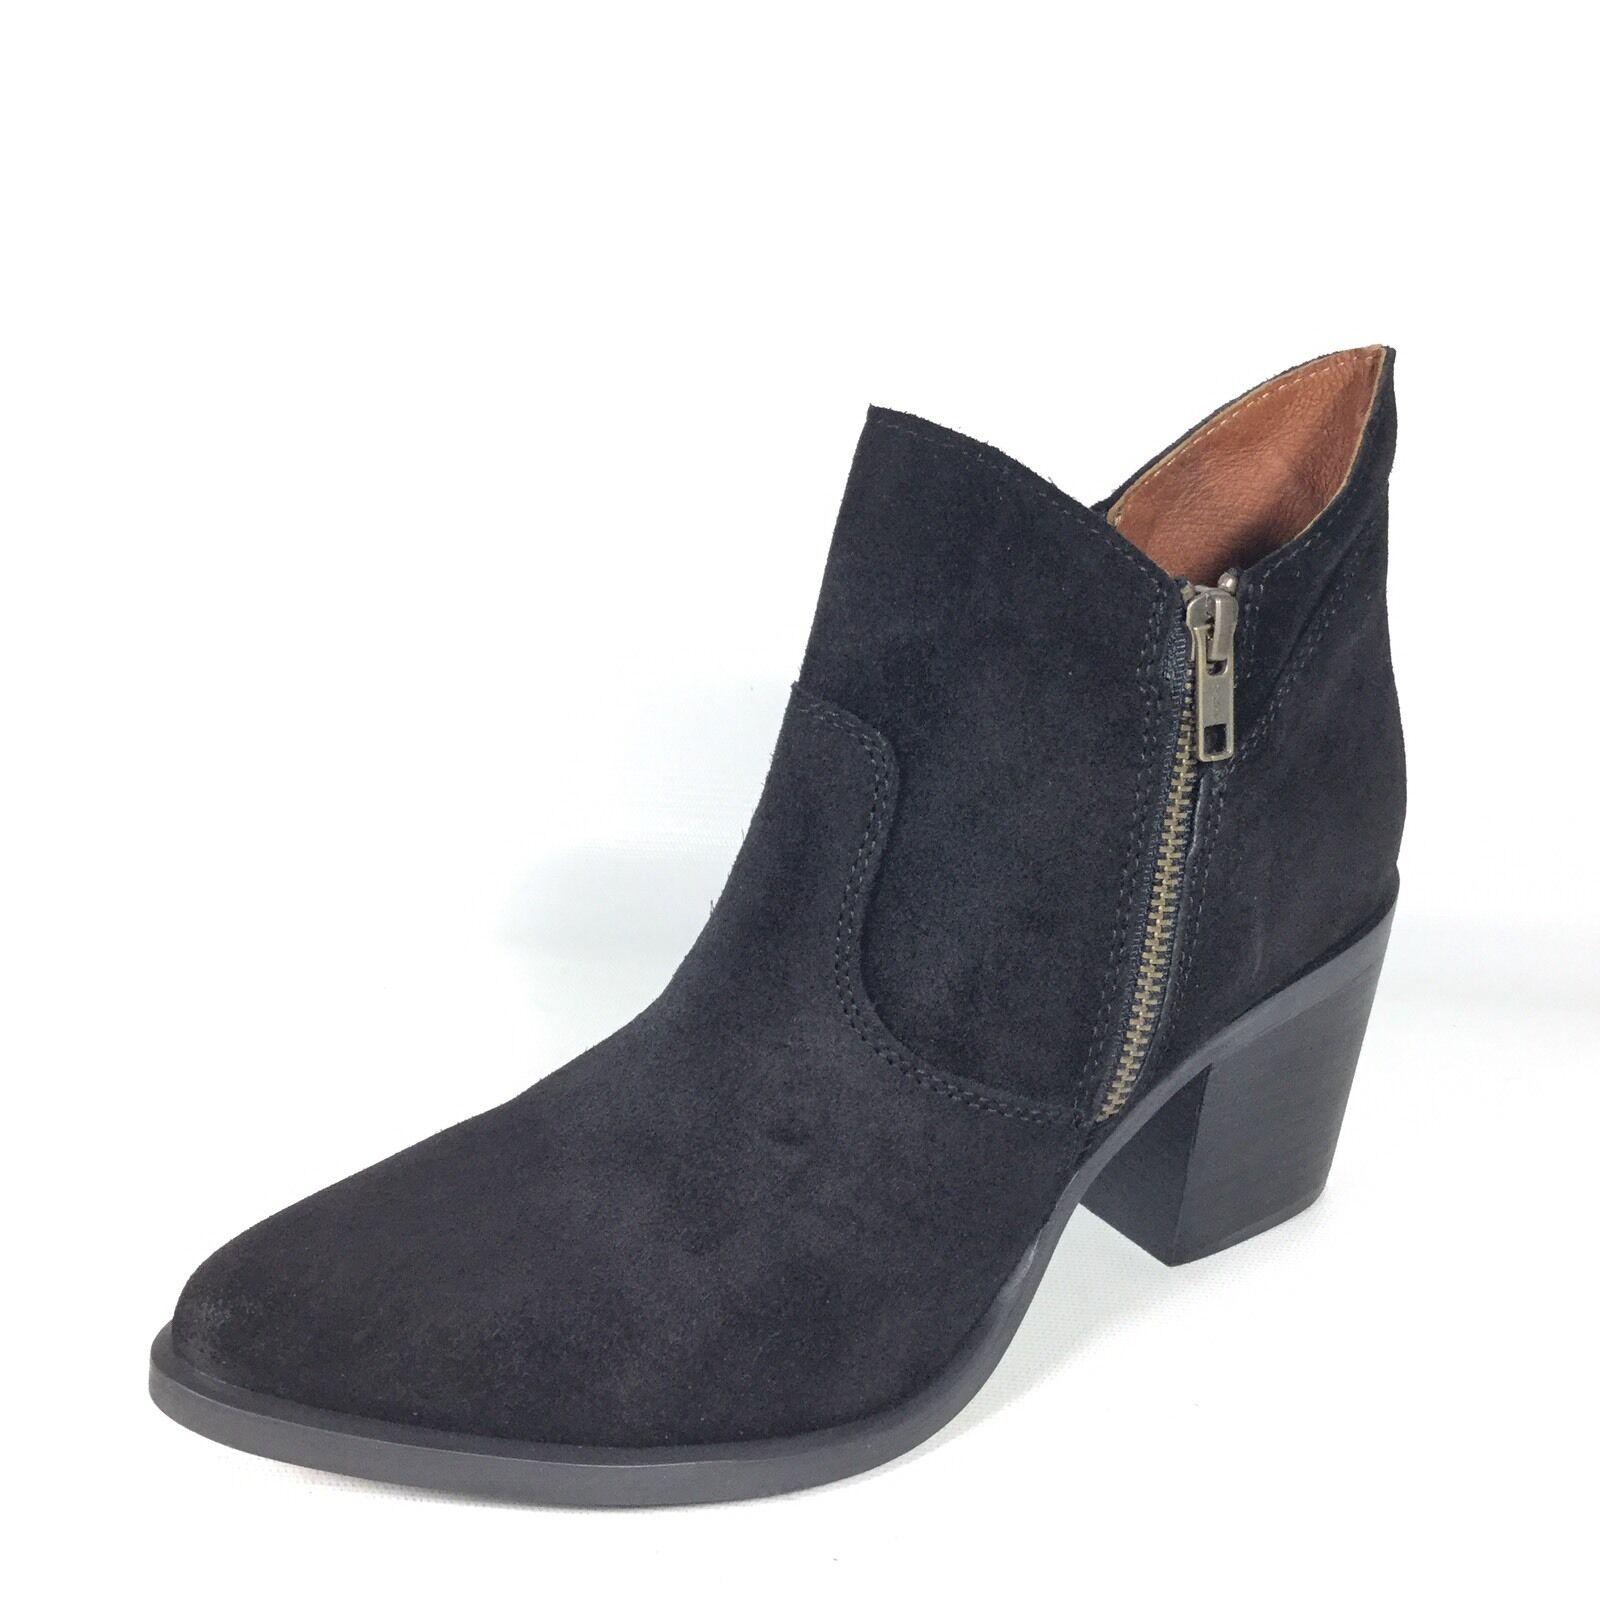 Steve Madden Pierce Women's Size 8 M Black Suede Block Heel Ankle Boots.